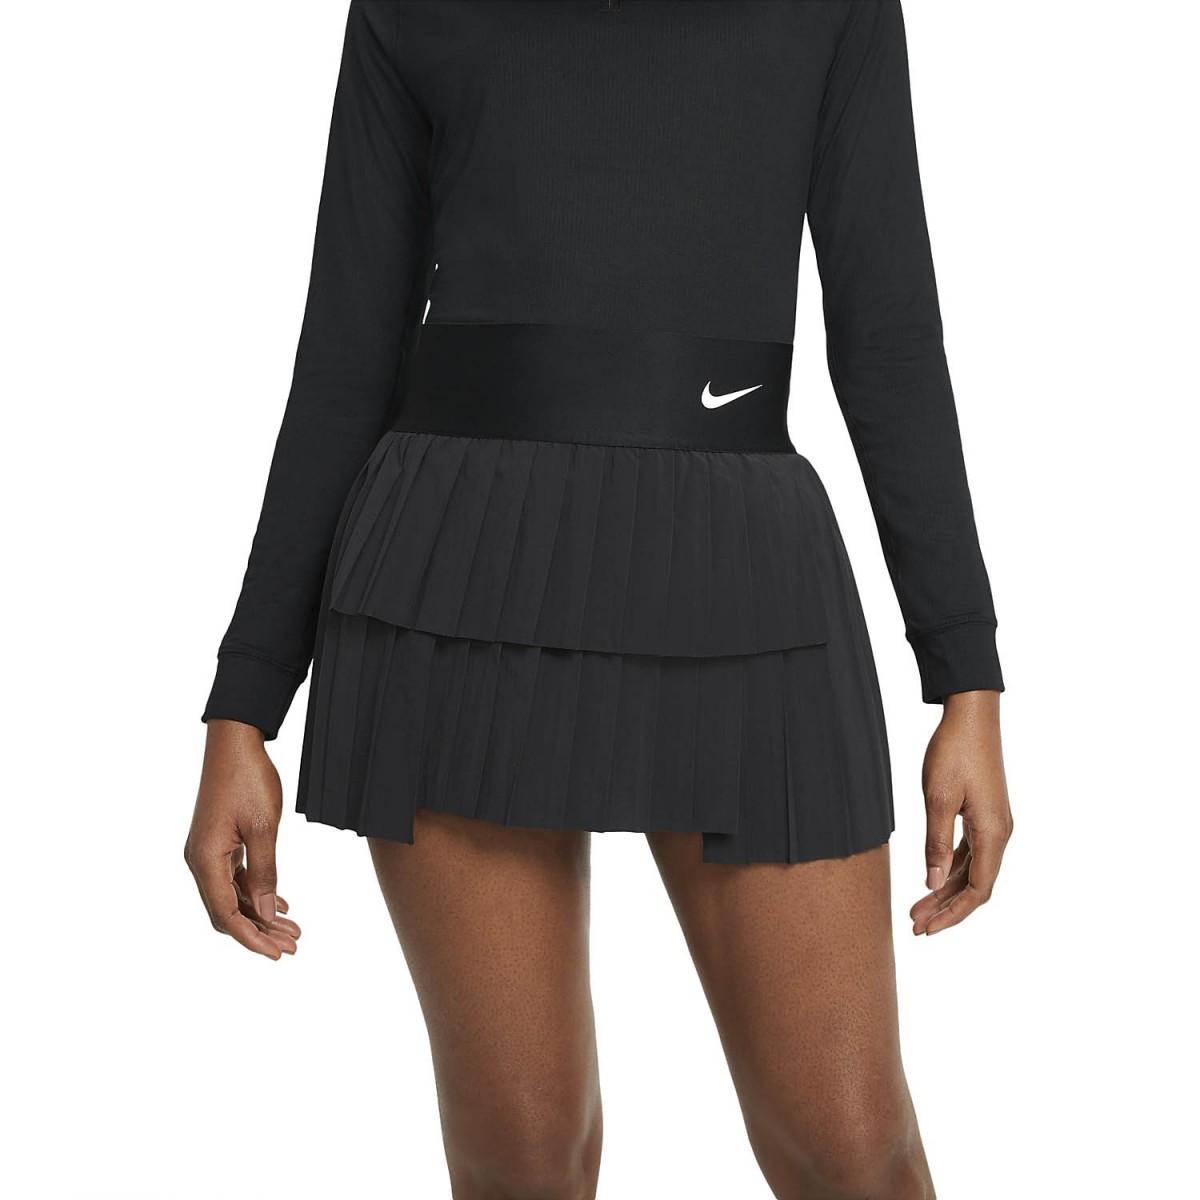 Теннисная юбка женская Nike Court Advantage Skirt Pleated black/white